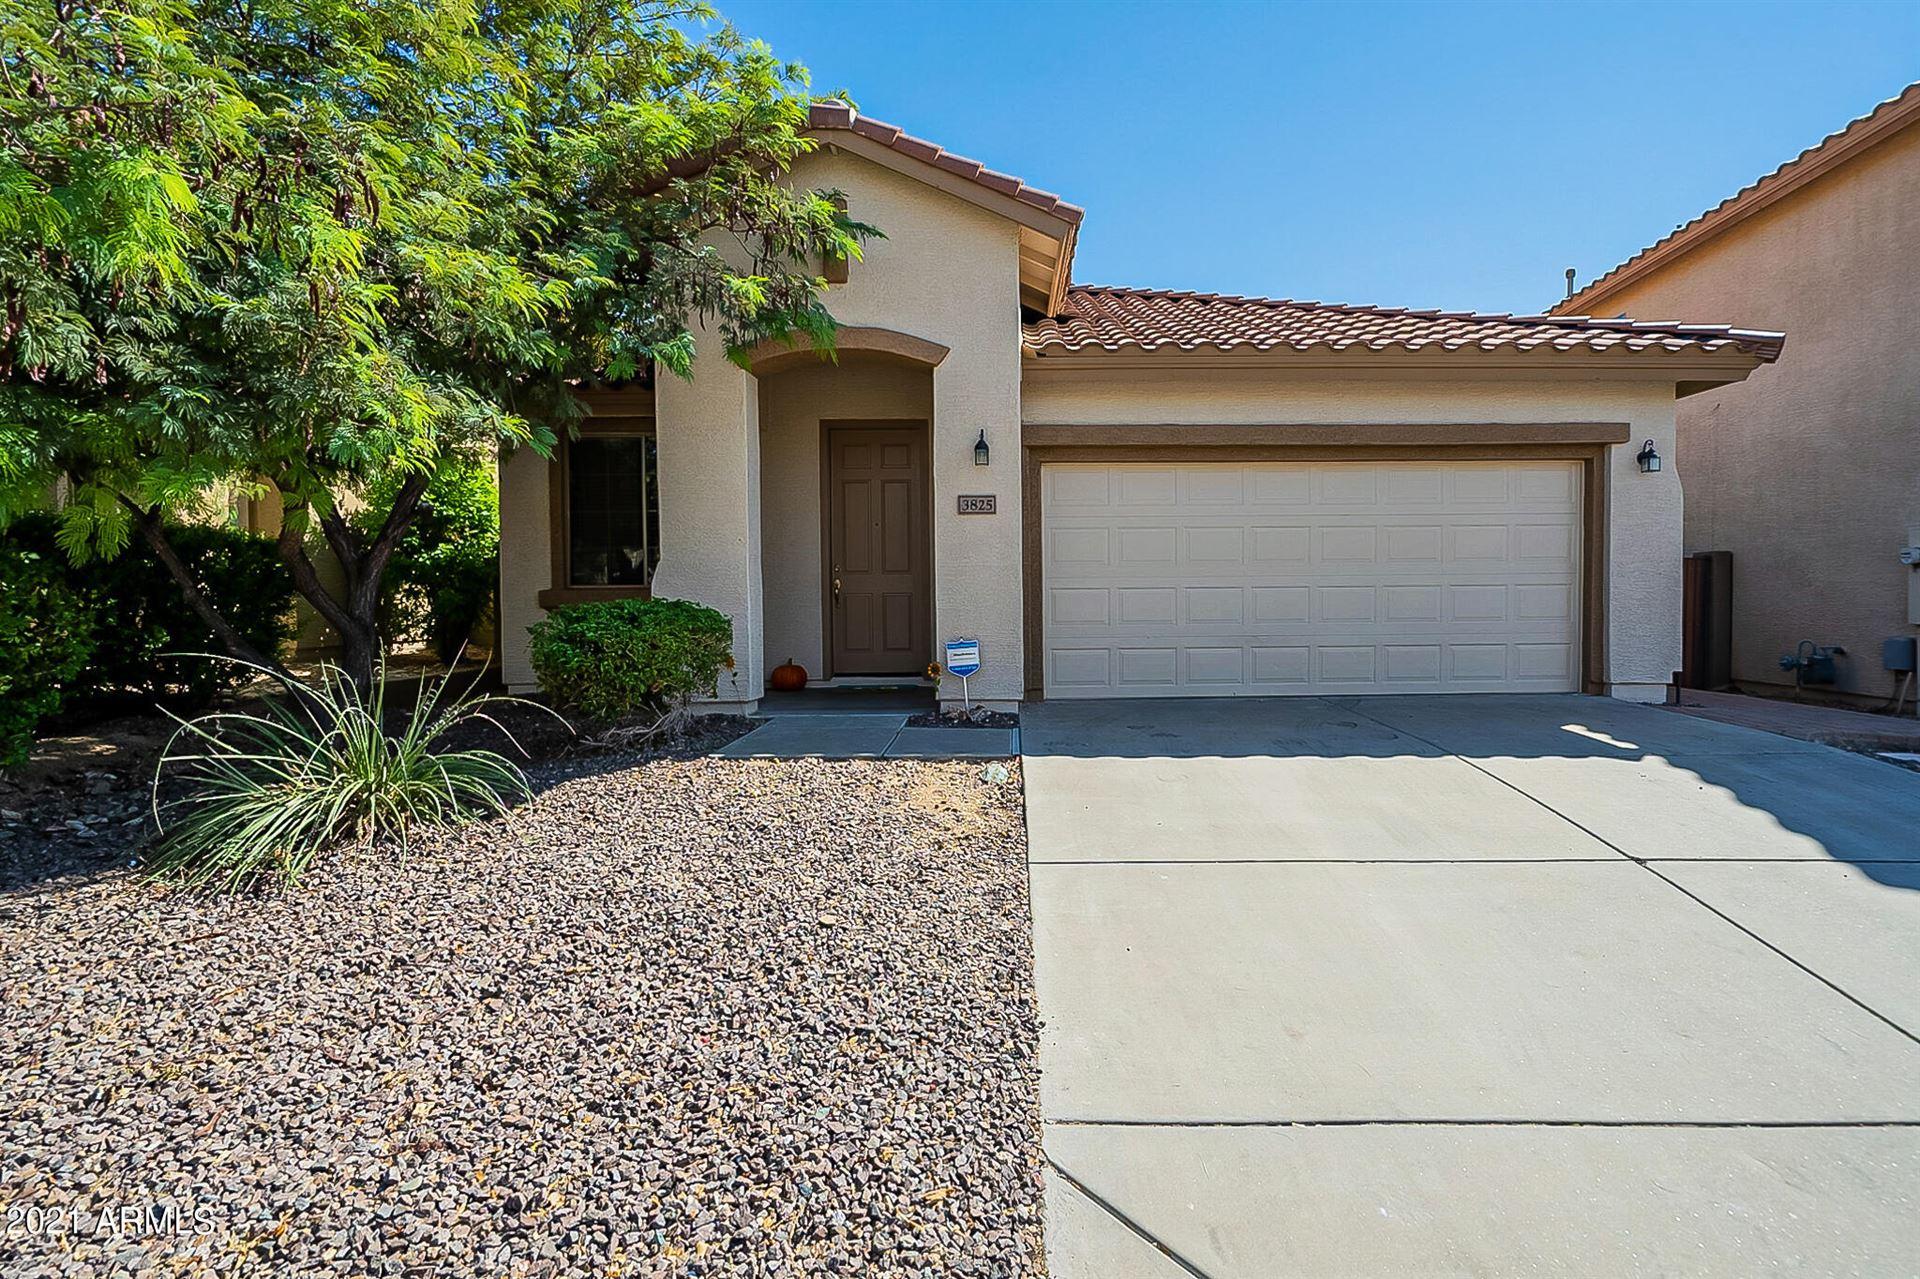 Photo of 3825 W Ashton Drive, Anthem, AZ 85086 (MLS # 6286291)